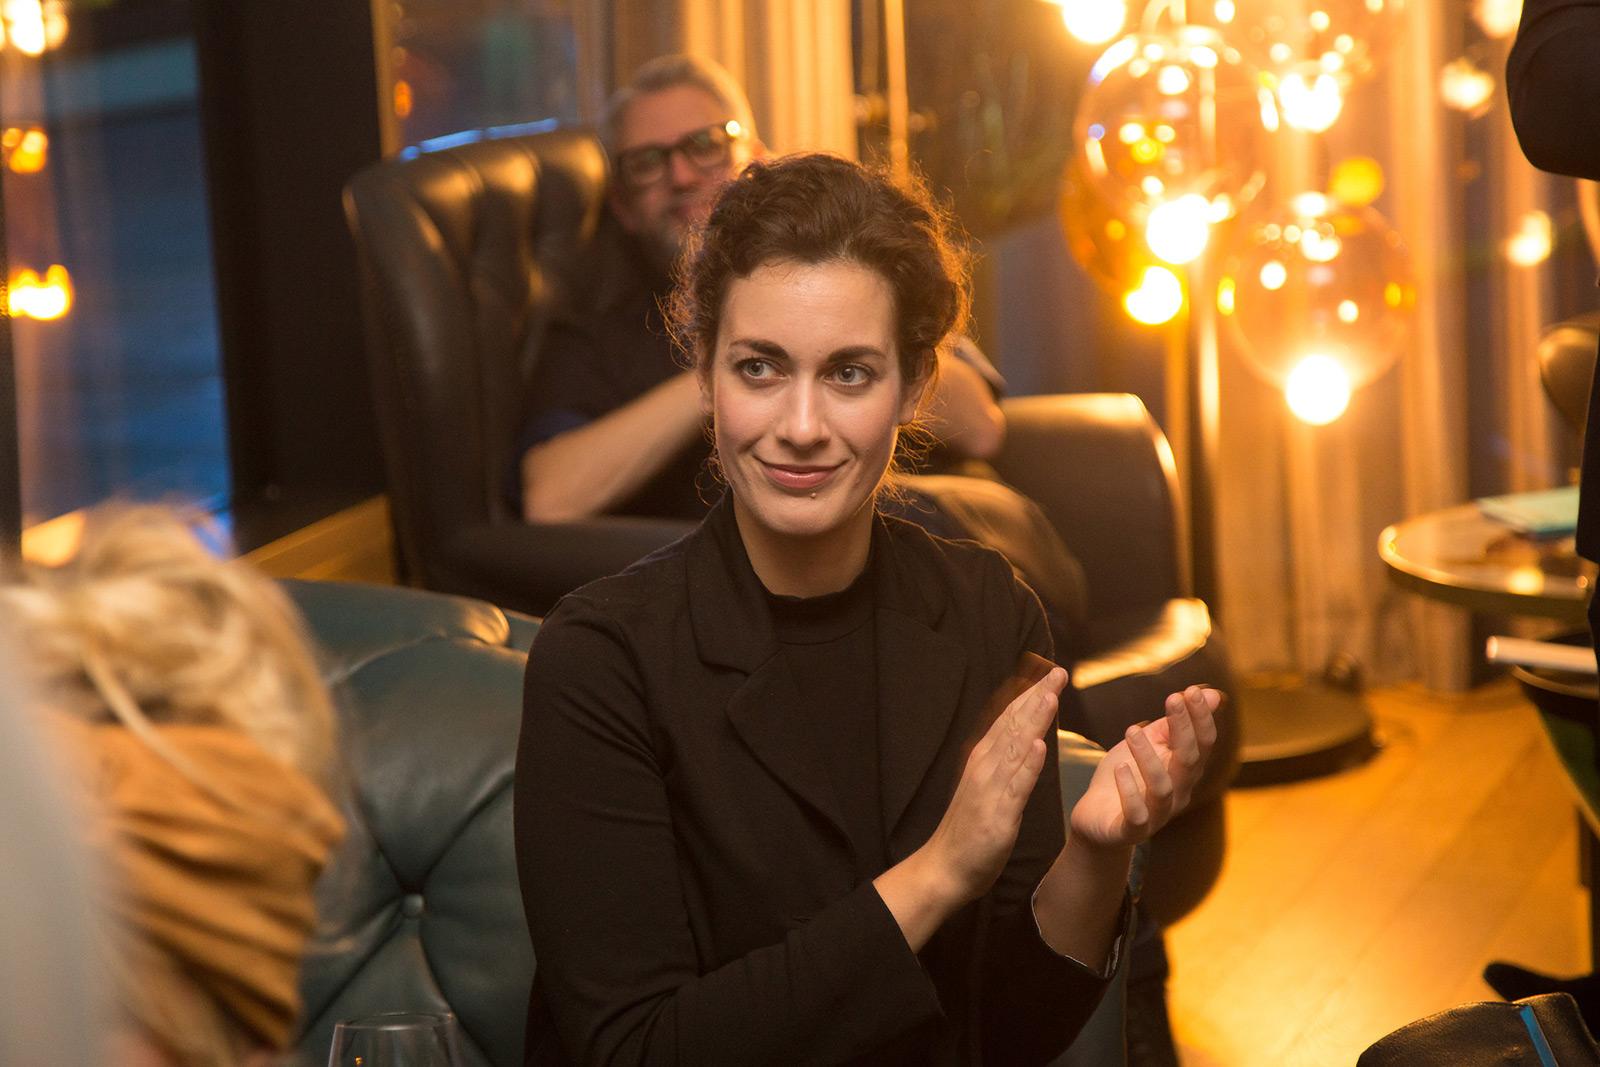 03 eventfotograf koeln bonn eventreportage motel one - Motel One Bonn Beethoven - Opening Event